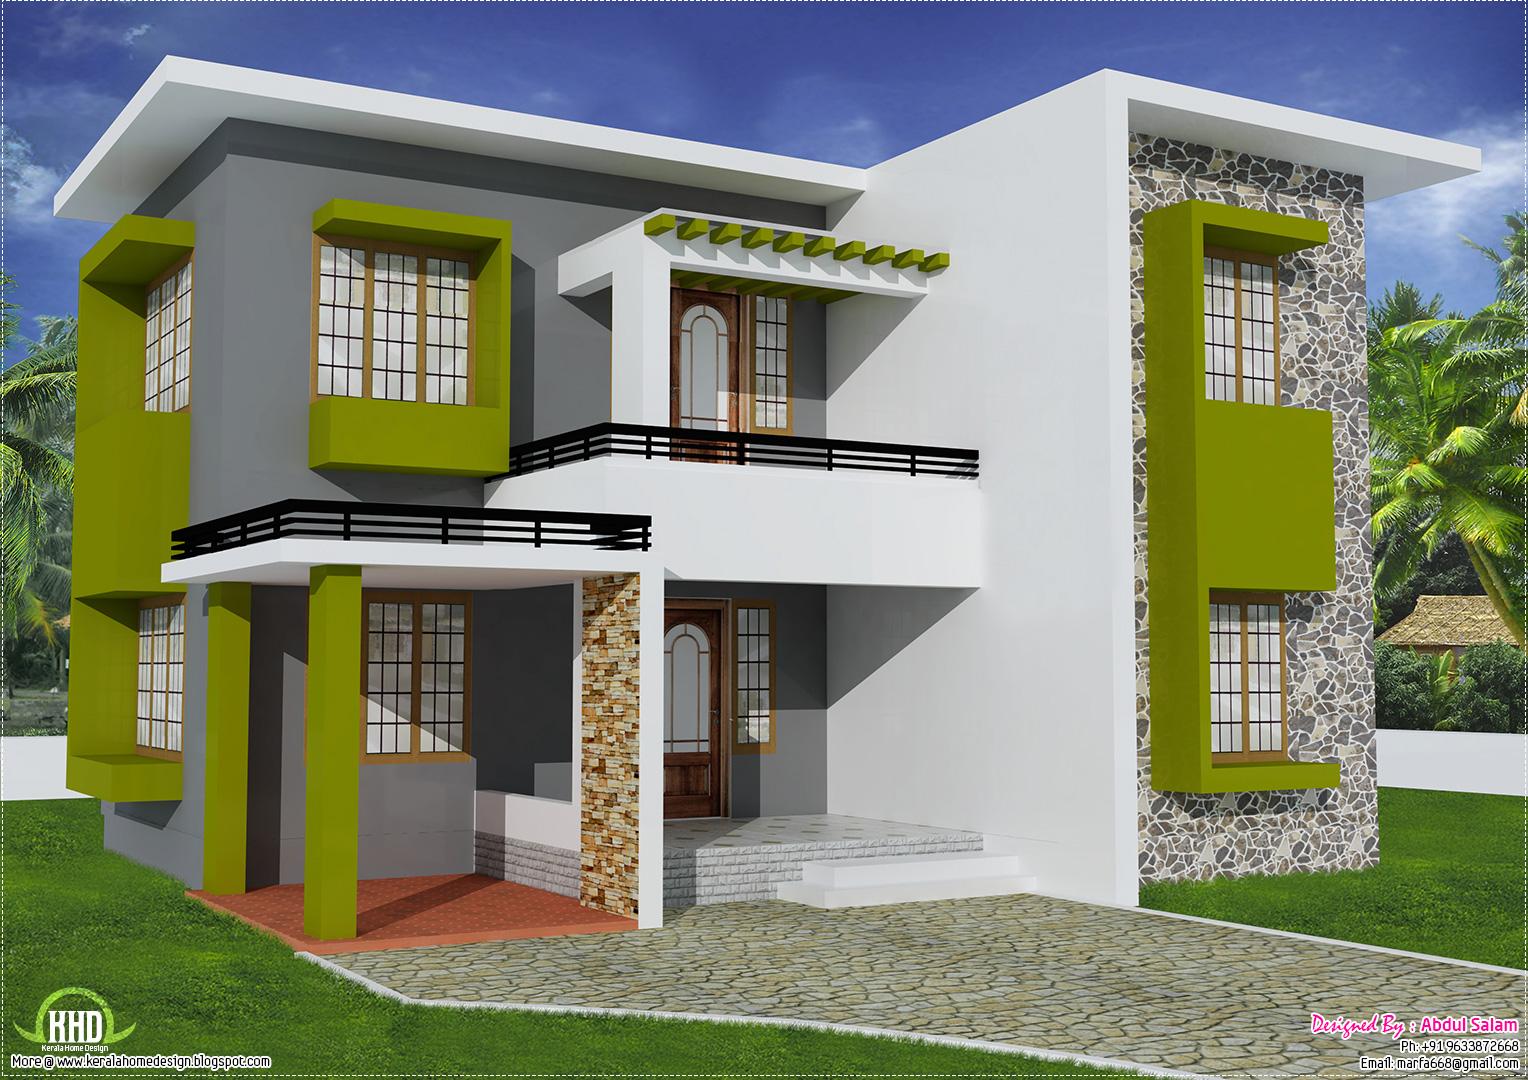 Best Kitchen Gallery: Home Designer Design A Home of Designing My Home  on rachelxblog.com